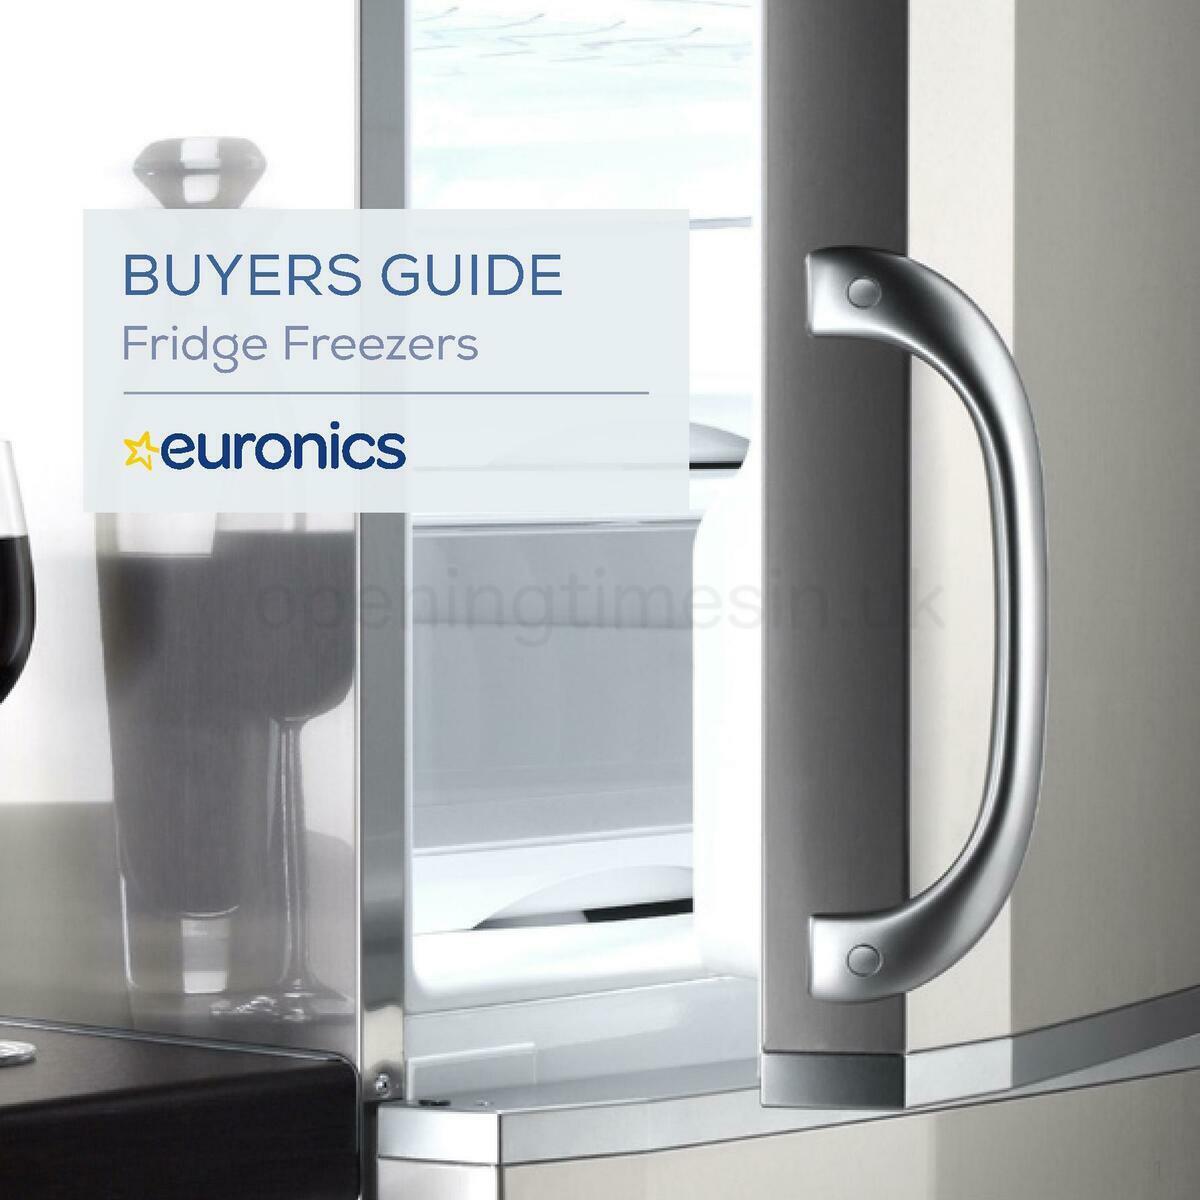 Euronics Fridge Freezers Buyers Guide Offers from January 1